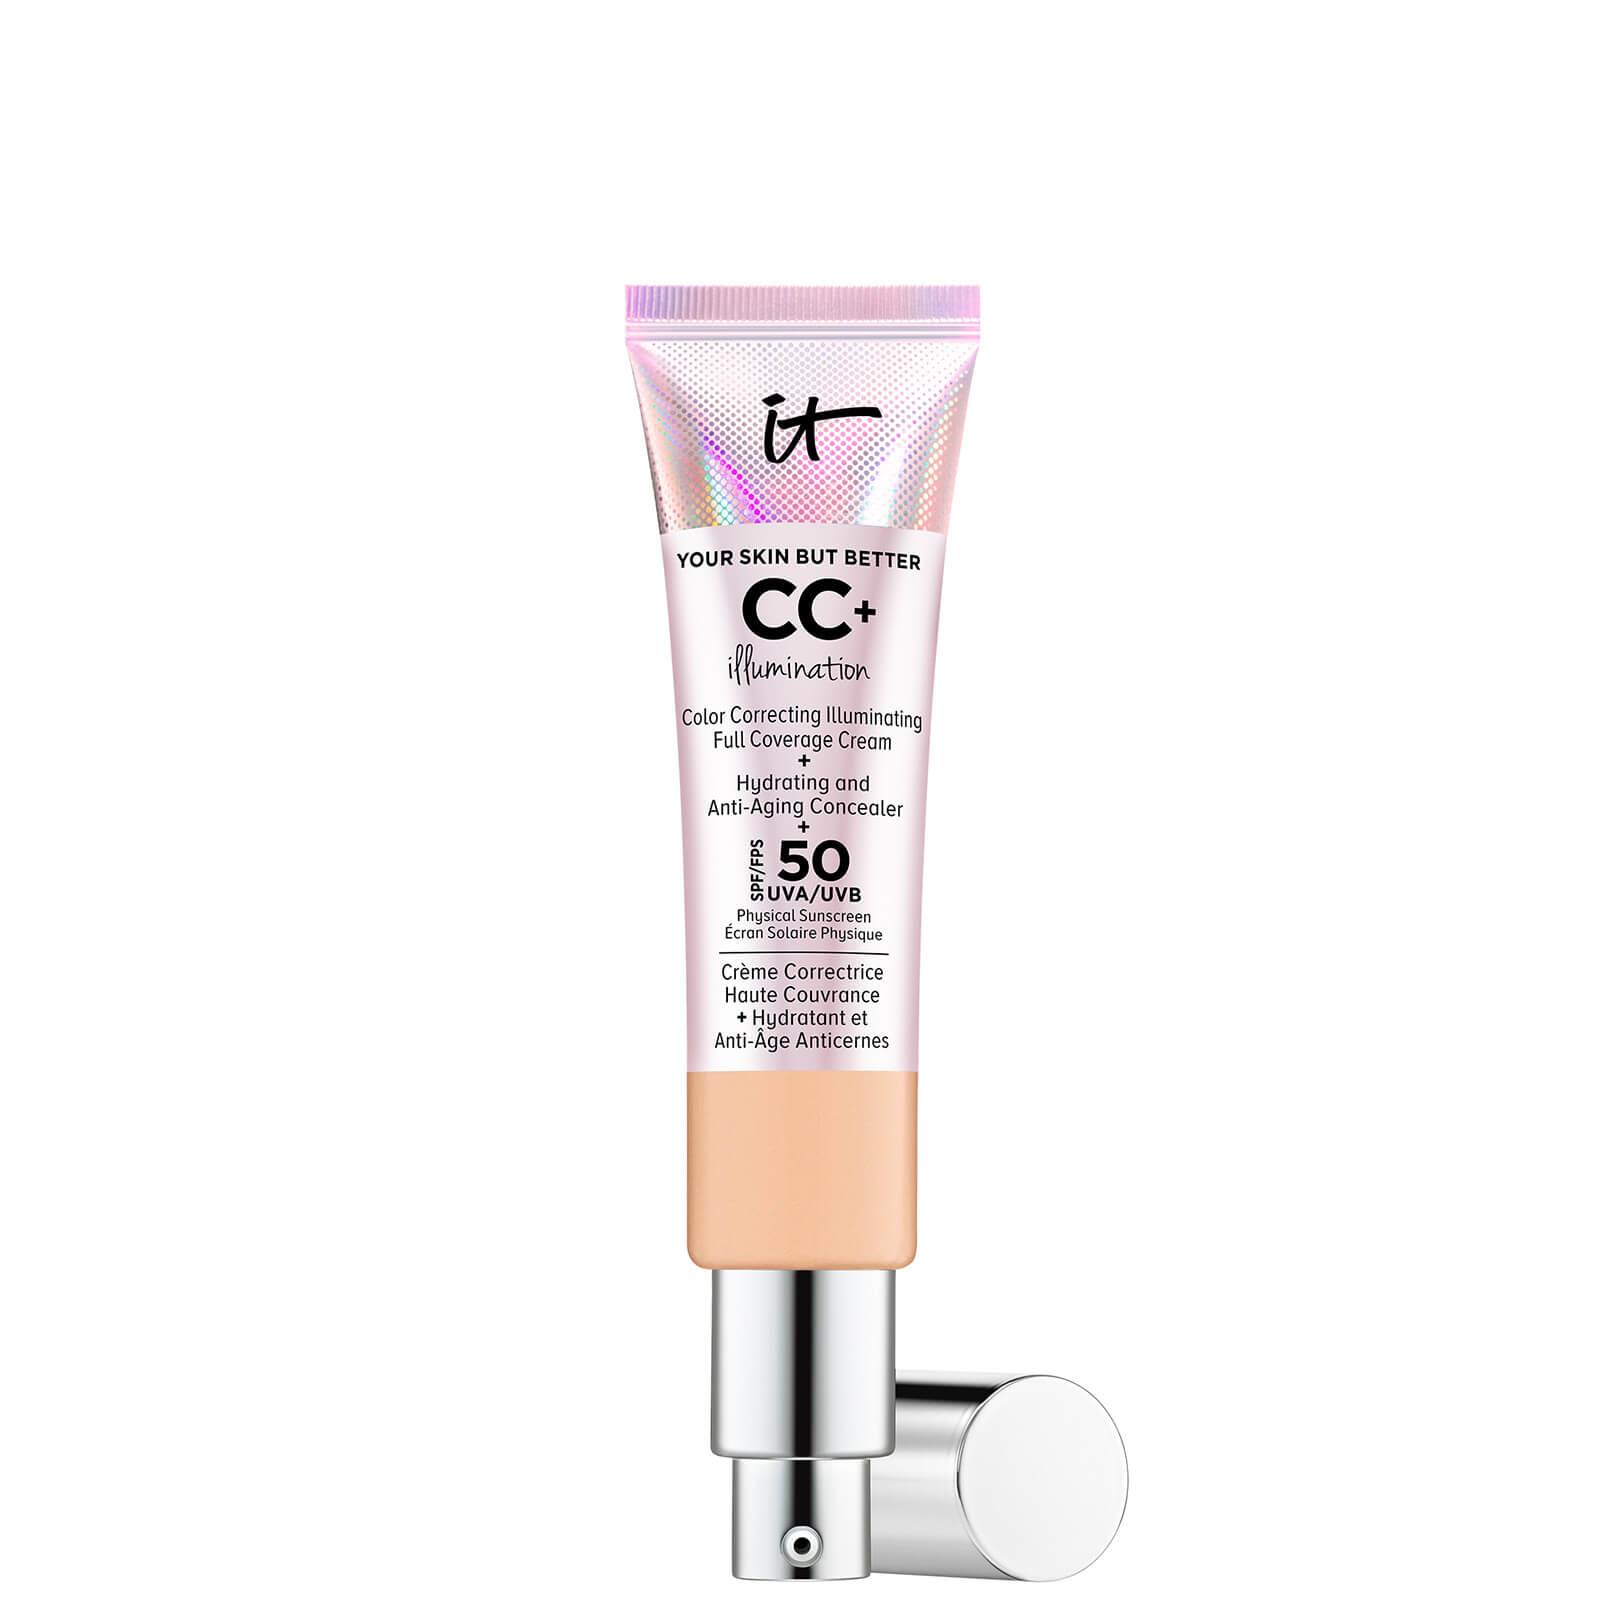 Купить IT Cosmetics Your Skin But Better CC+ Illumination SPF50 32ml (Various Shades) - Medium